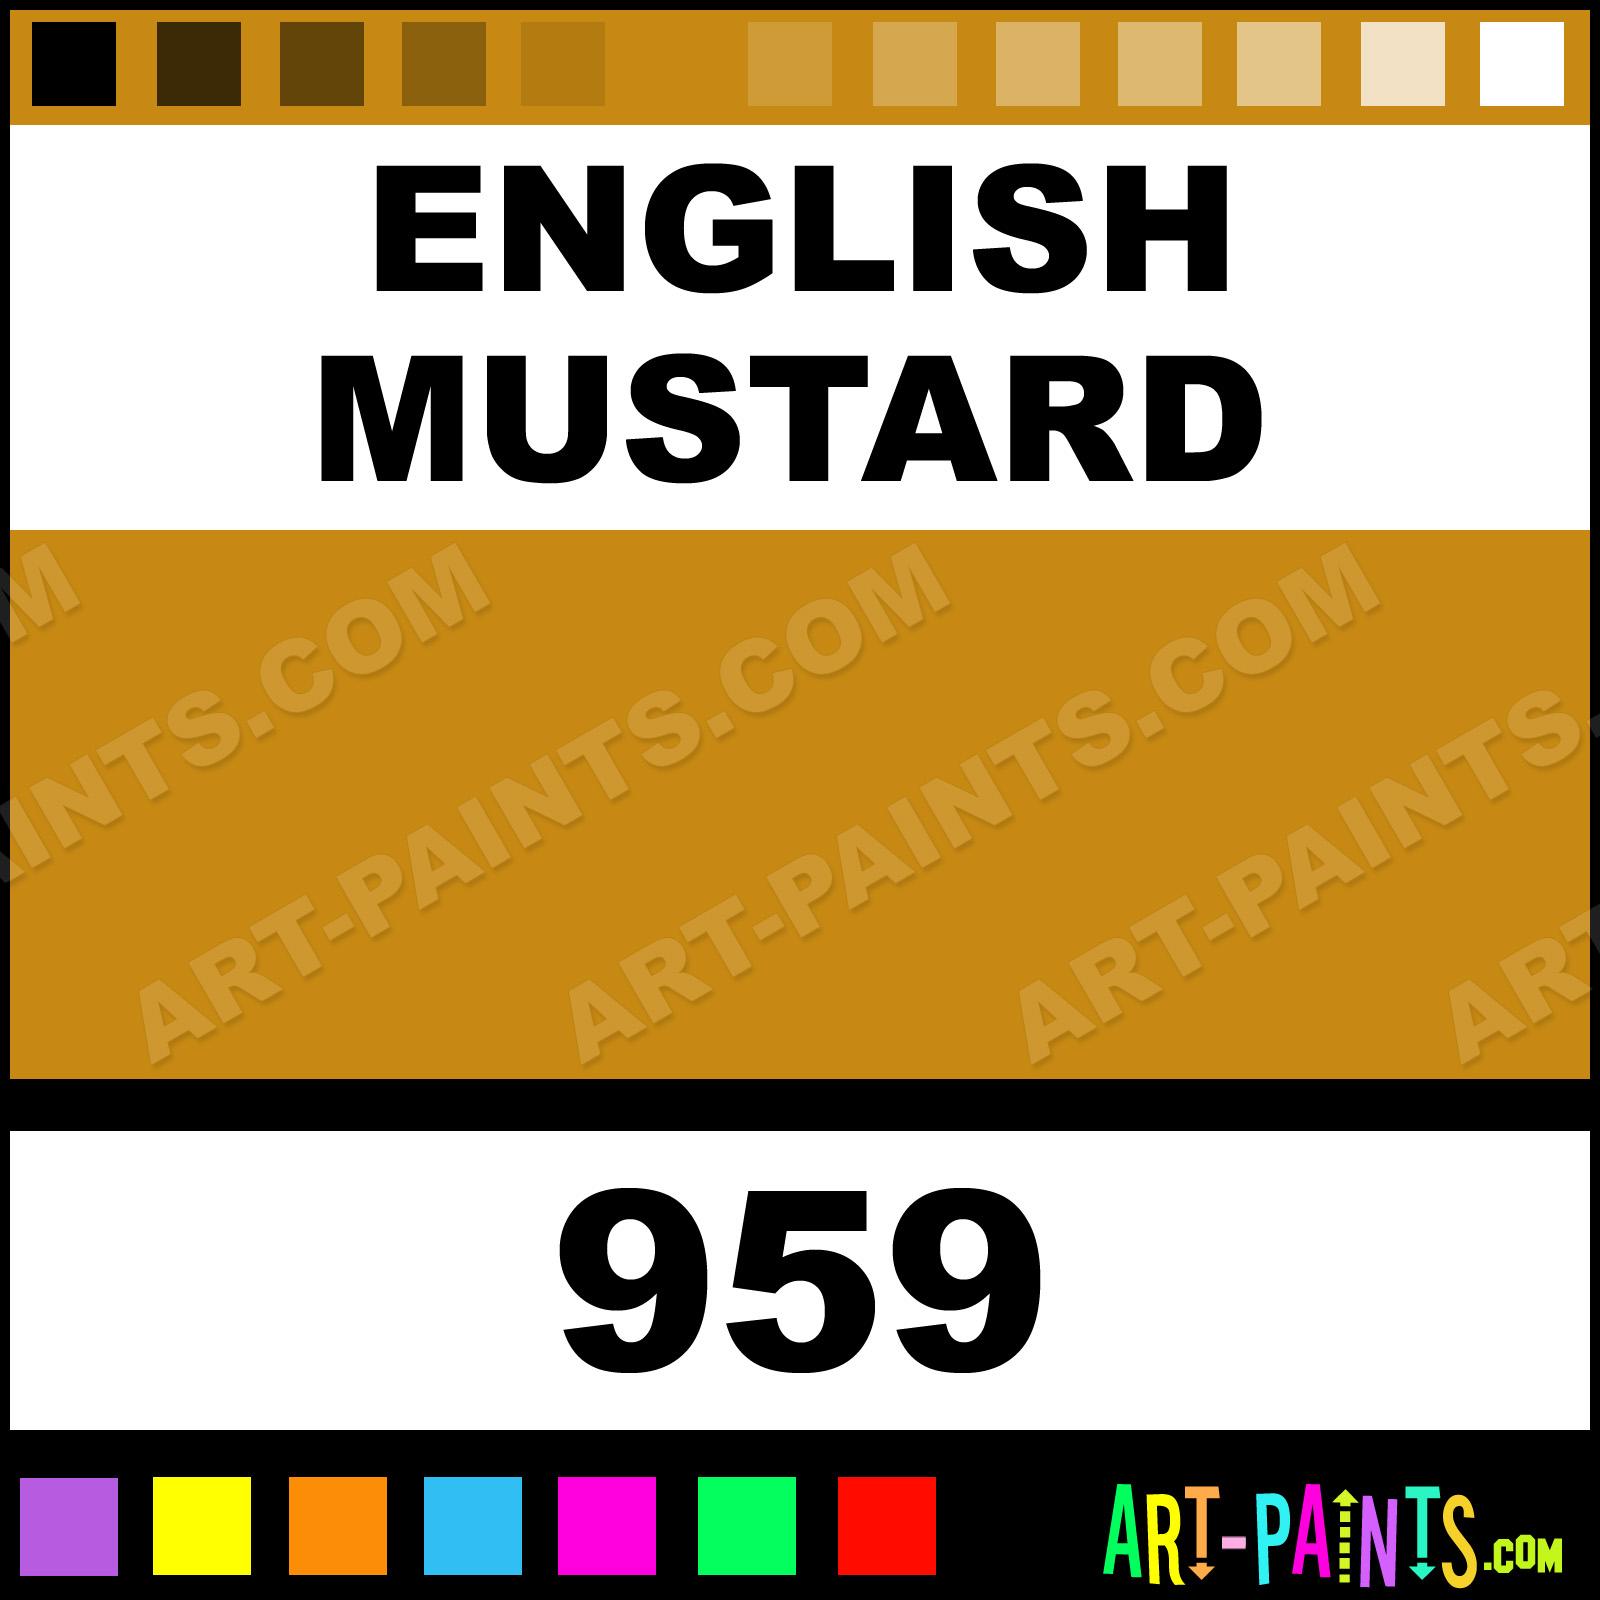 Folk art color chart acrylic paint - English Mustard Paint